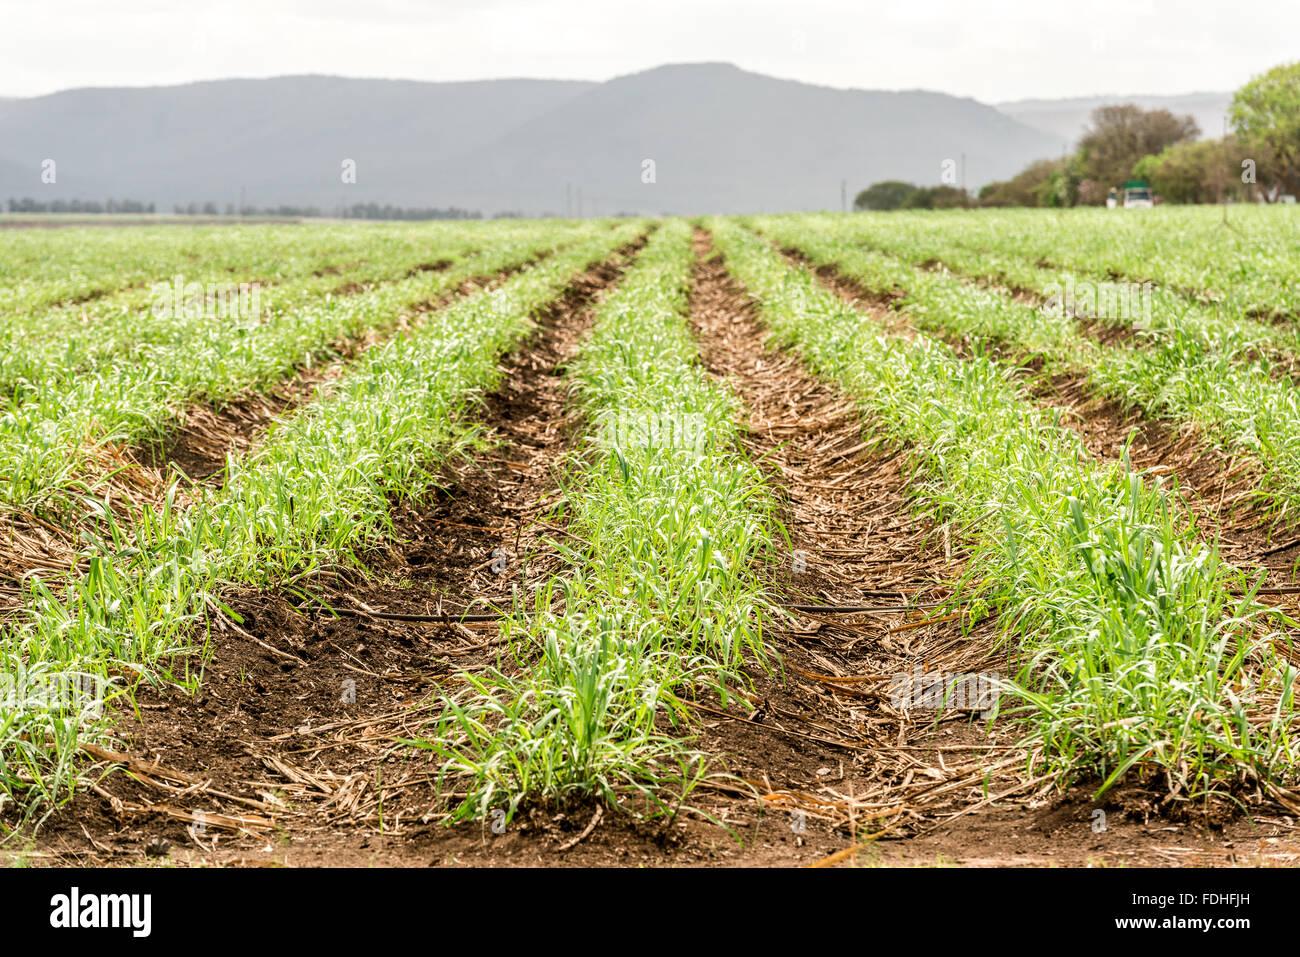 Sugarcane growing in Lubombo, Swaziland, Africa. - Stock Image